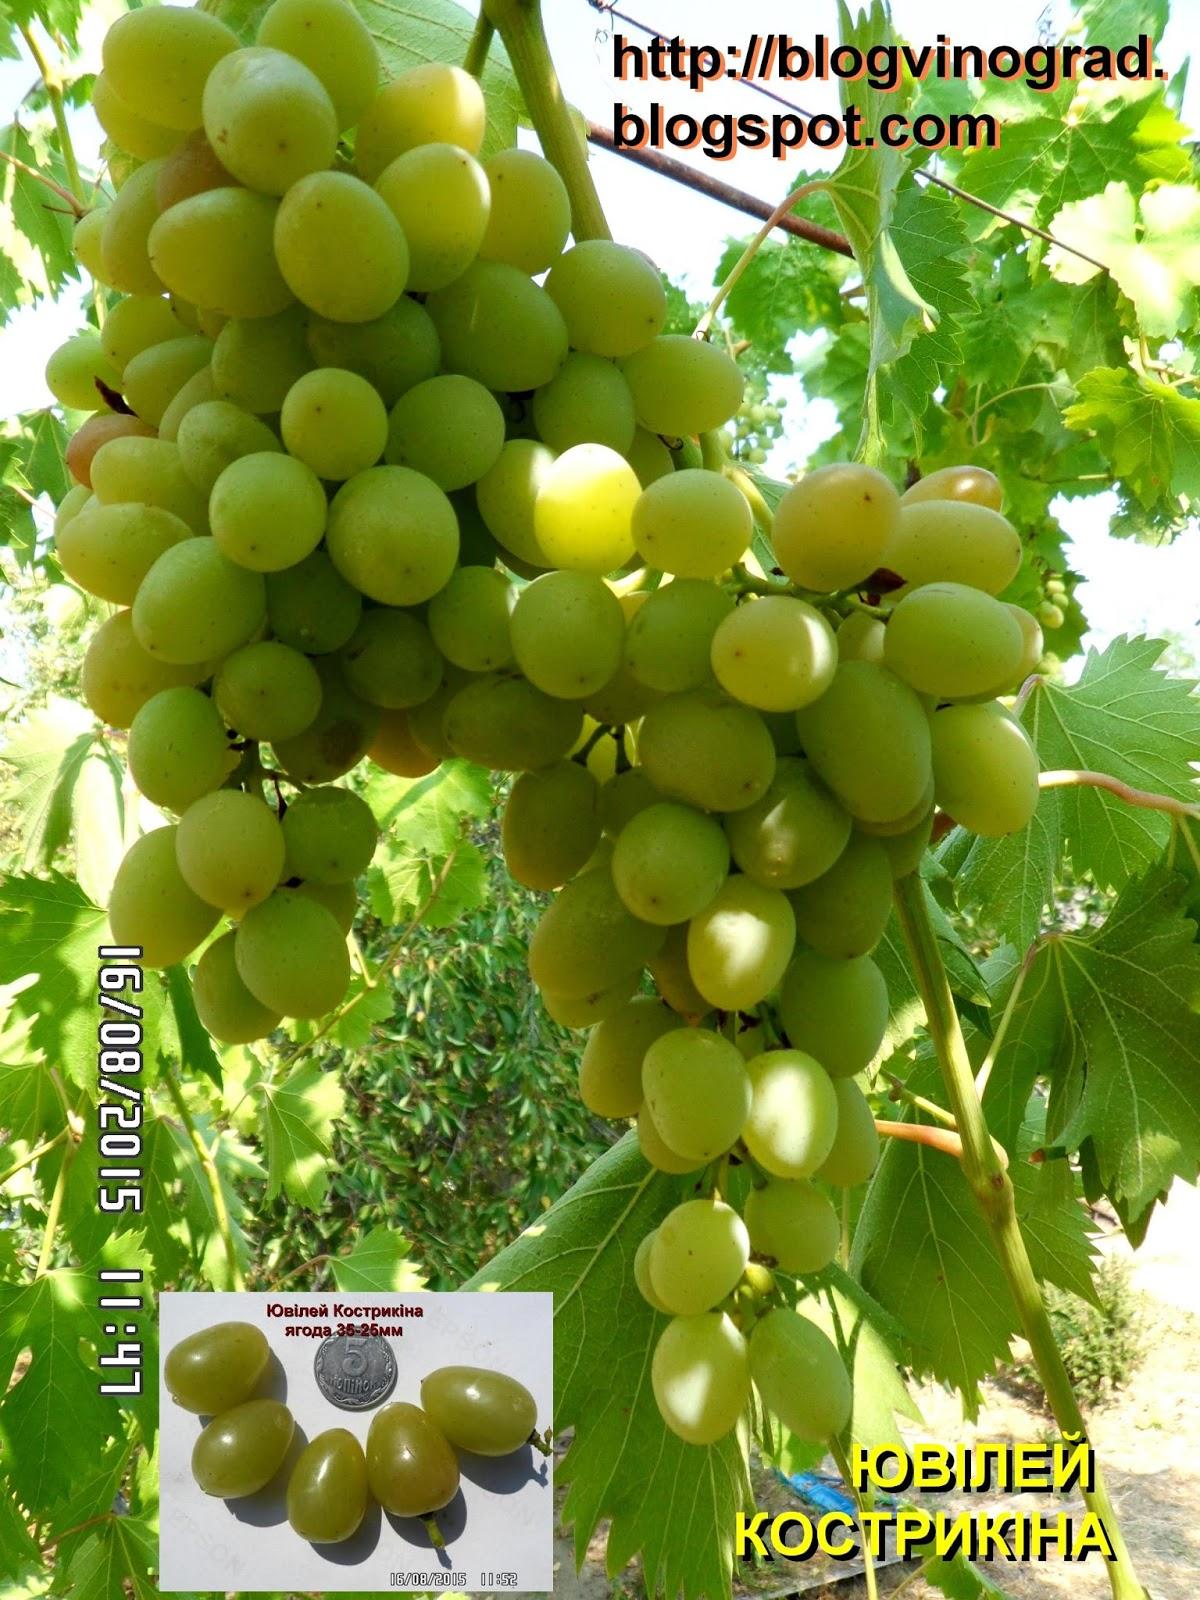 Виноград подарок херсонского дачника